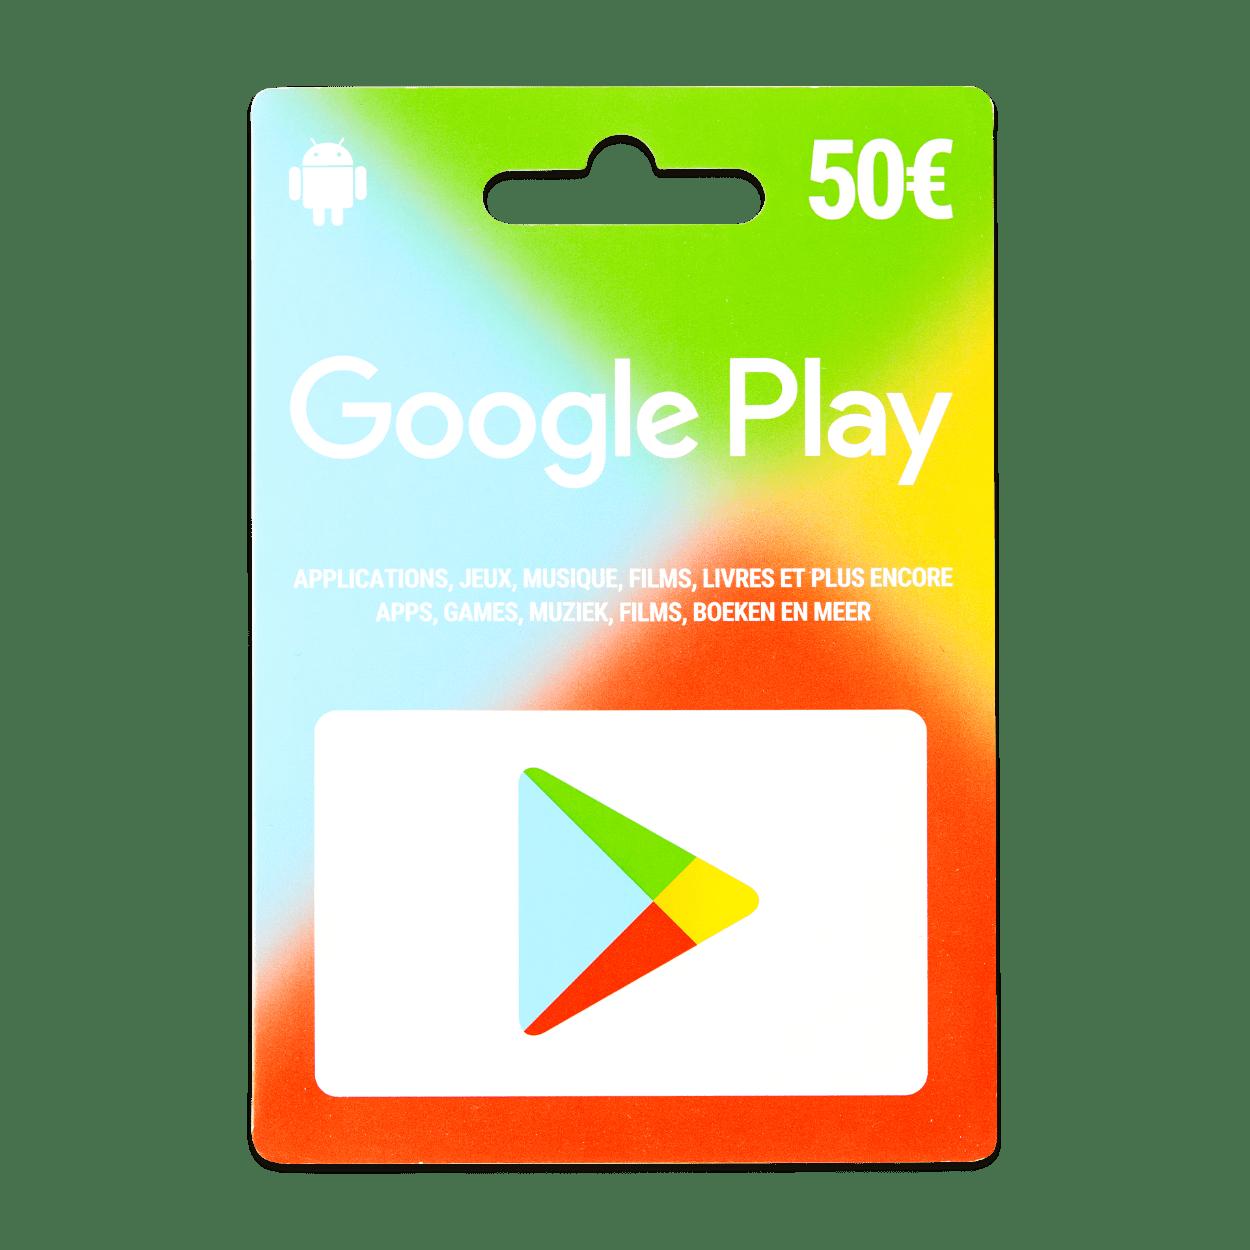 Playstore Karte.Google Play Karte 50 Euro Günstig Bei Aldi